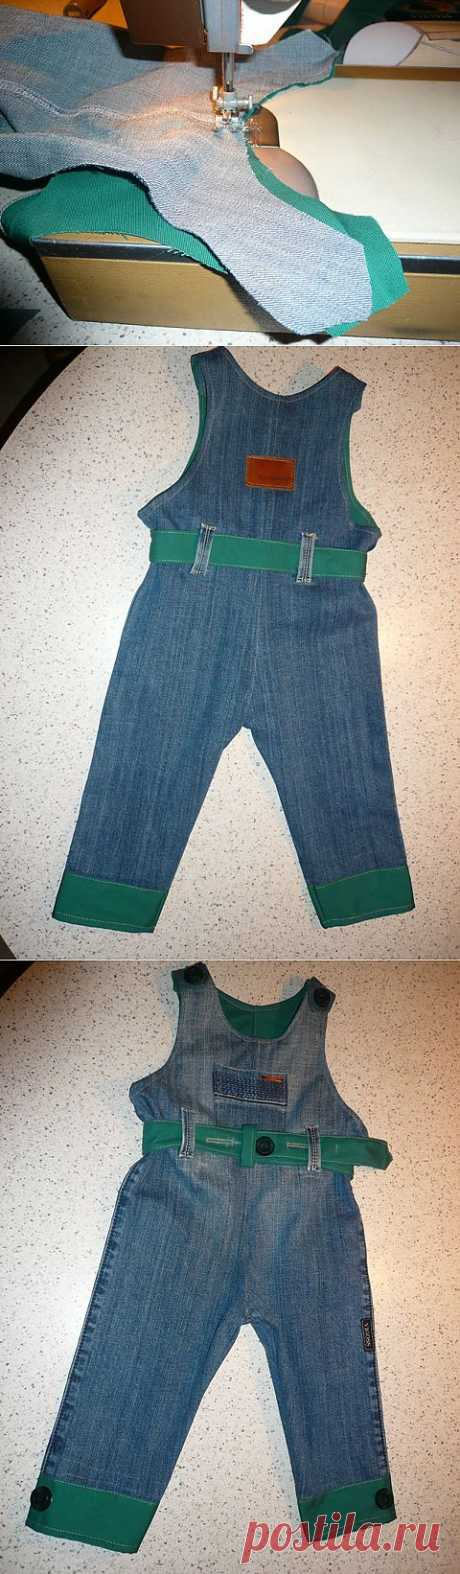 ¡La segunda vida de los pantalones jeans | HAZ!